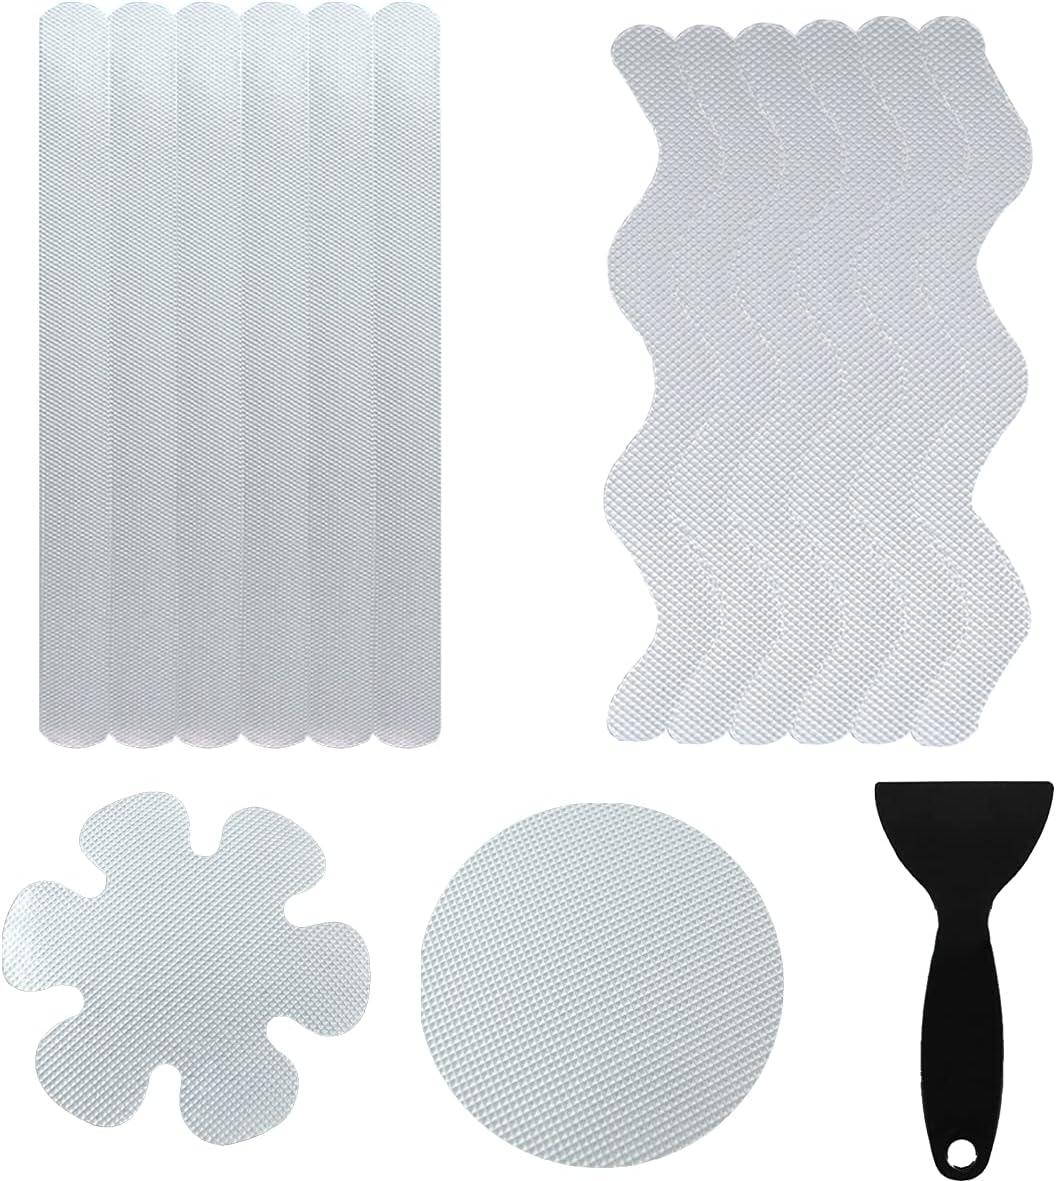 ! Super beauty product restock quality top! Modpion 73Pcs Non Slip Ranking TOP8 Bathtub Adhesiv Stickers Thread Bathroom